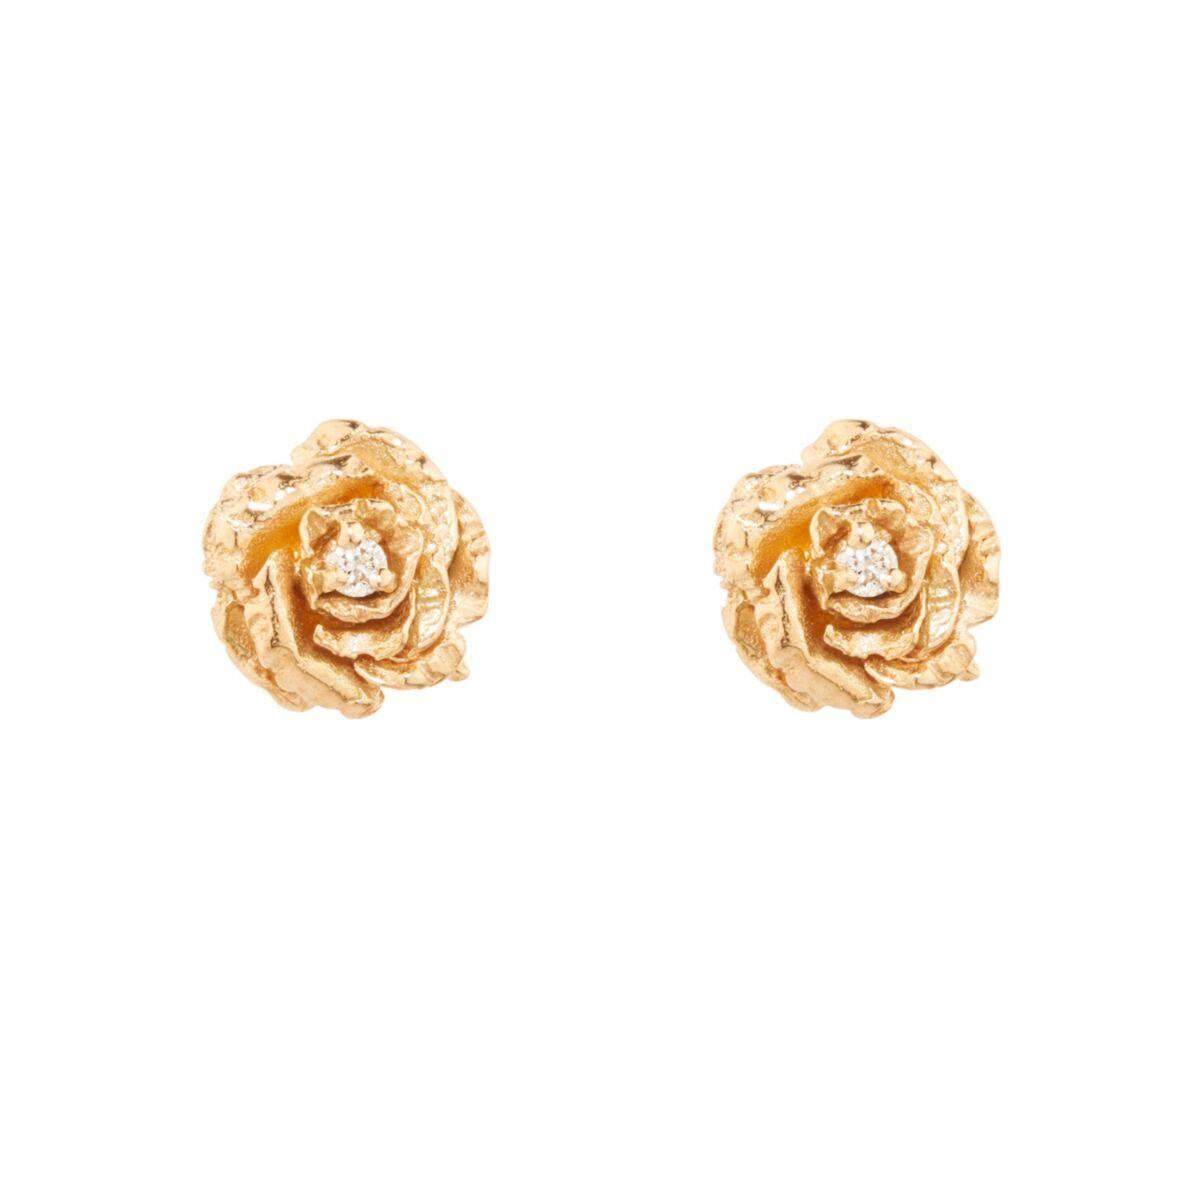 Dewy Diamond Rose Stud (single) image